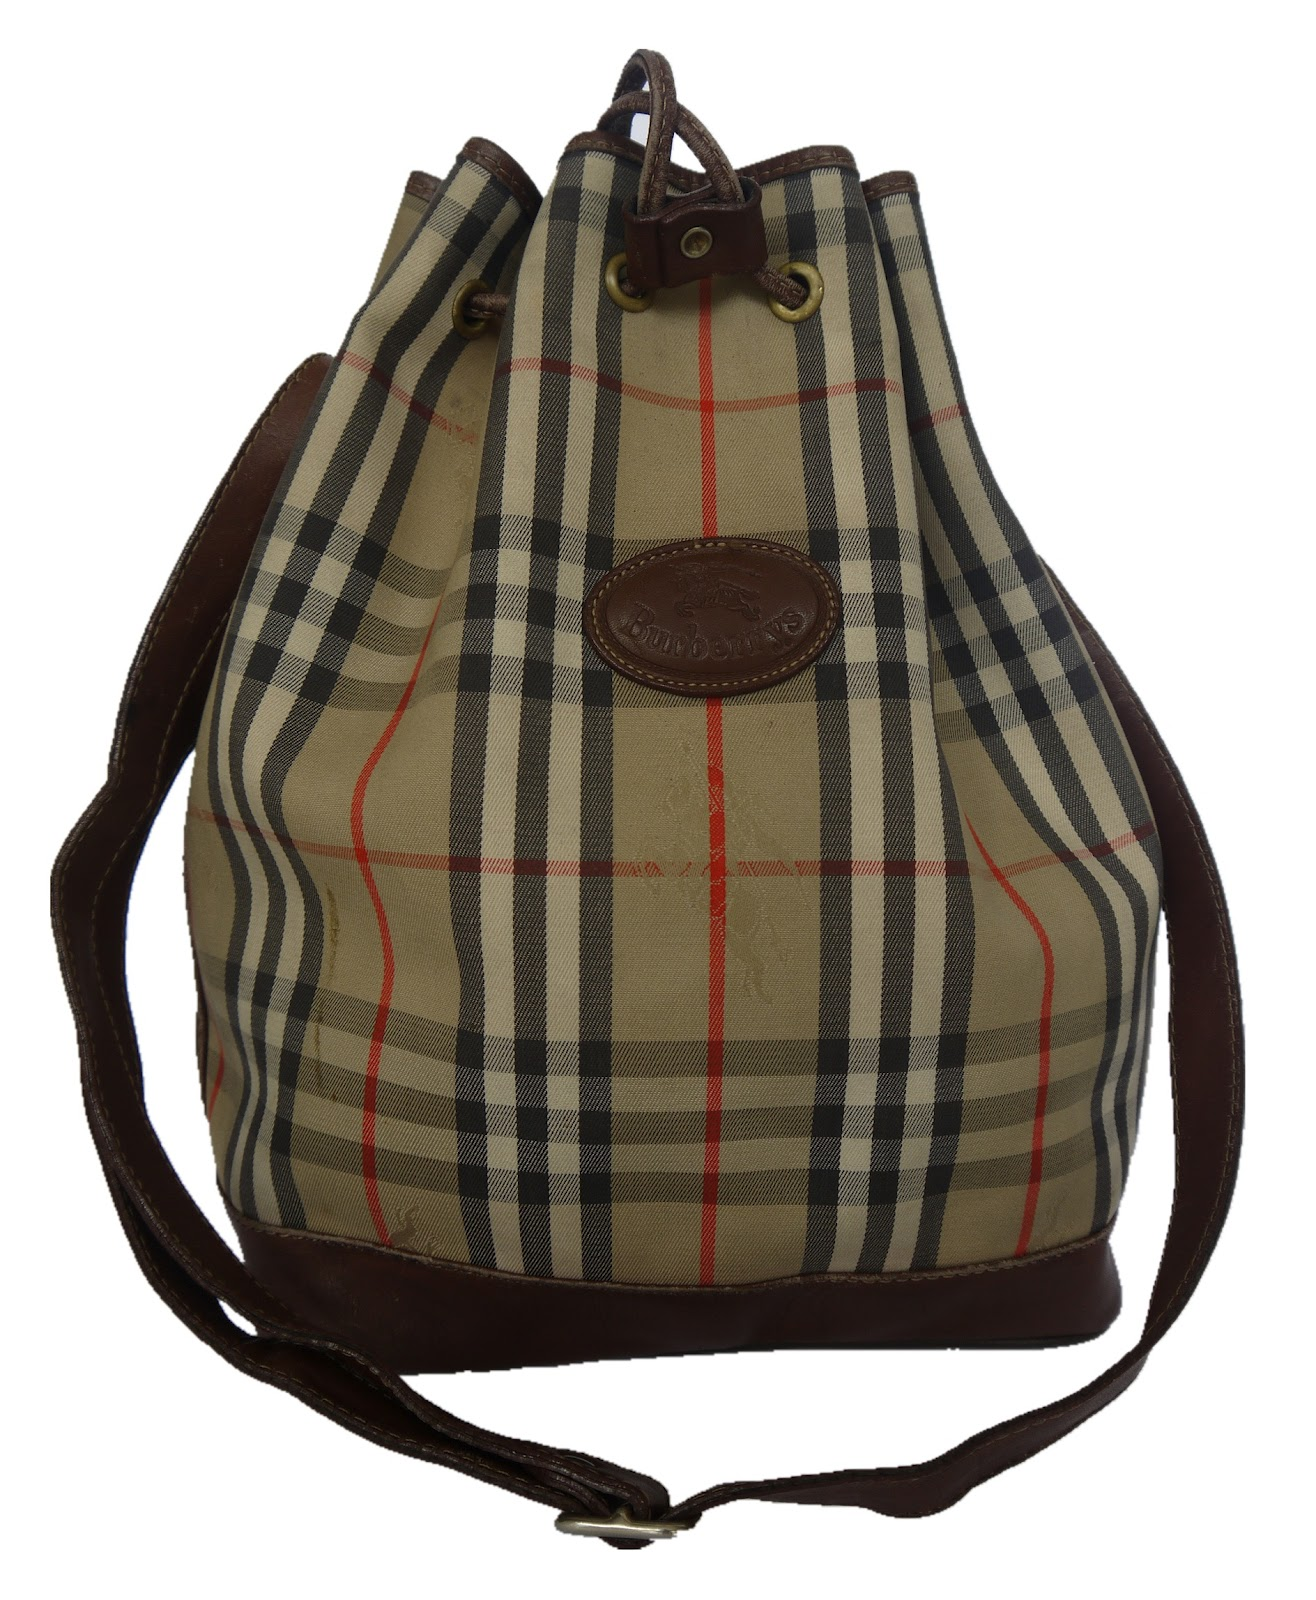 Burberry London Bucket Bag